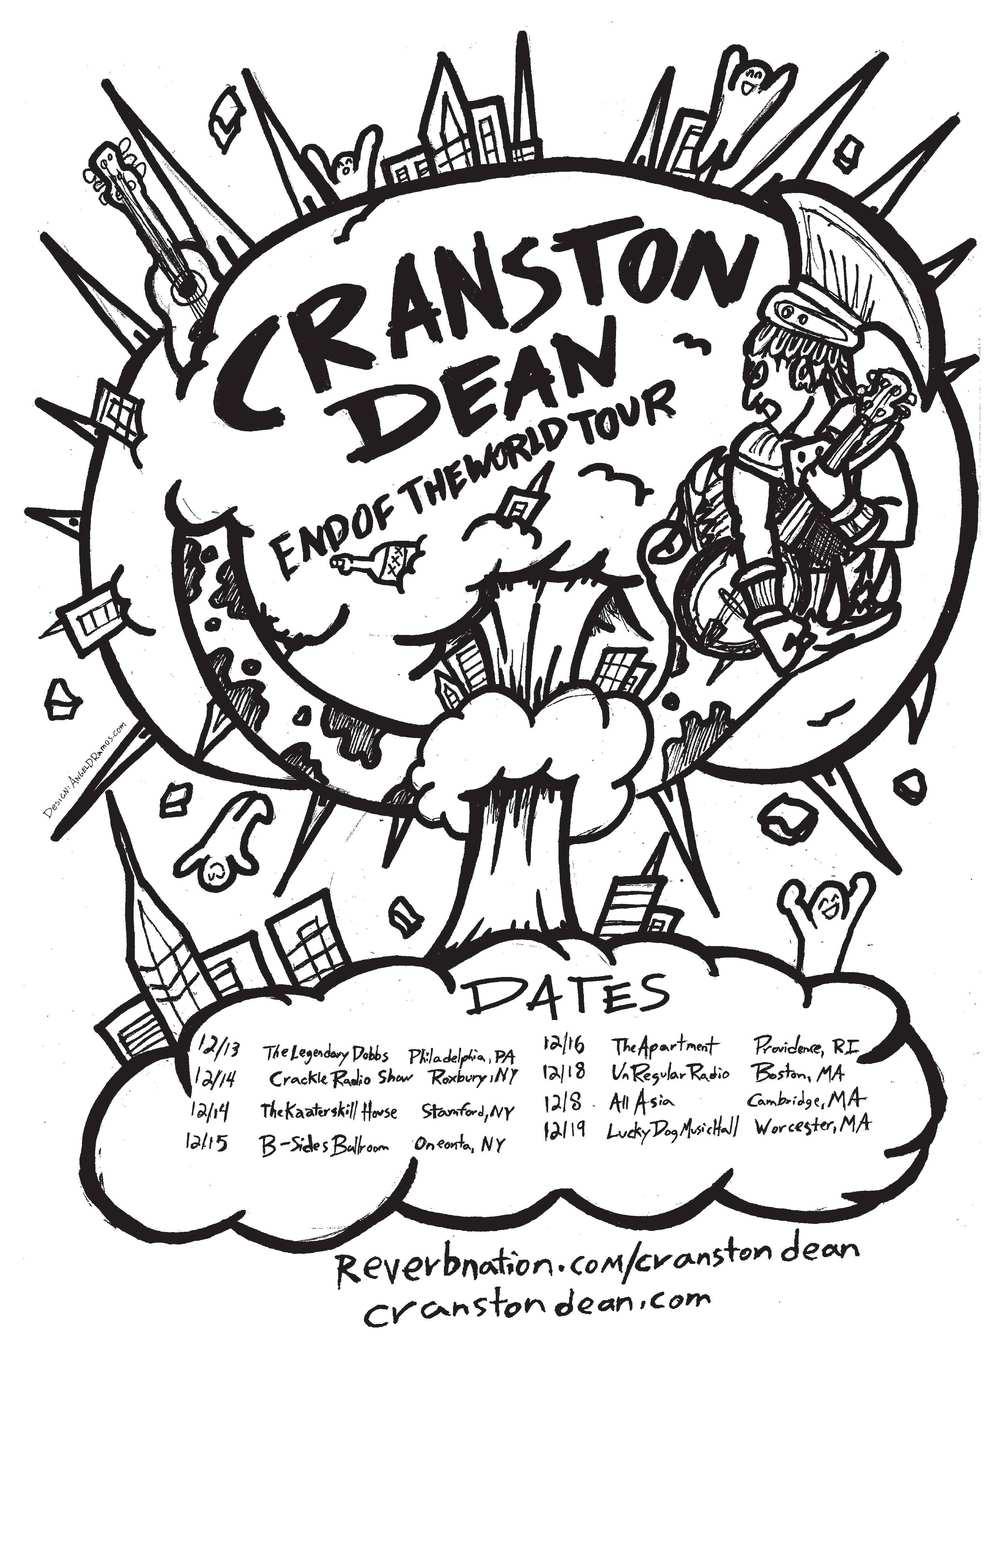 Poster for Cranston Dean